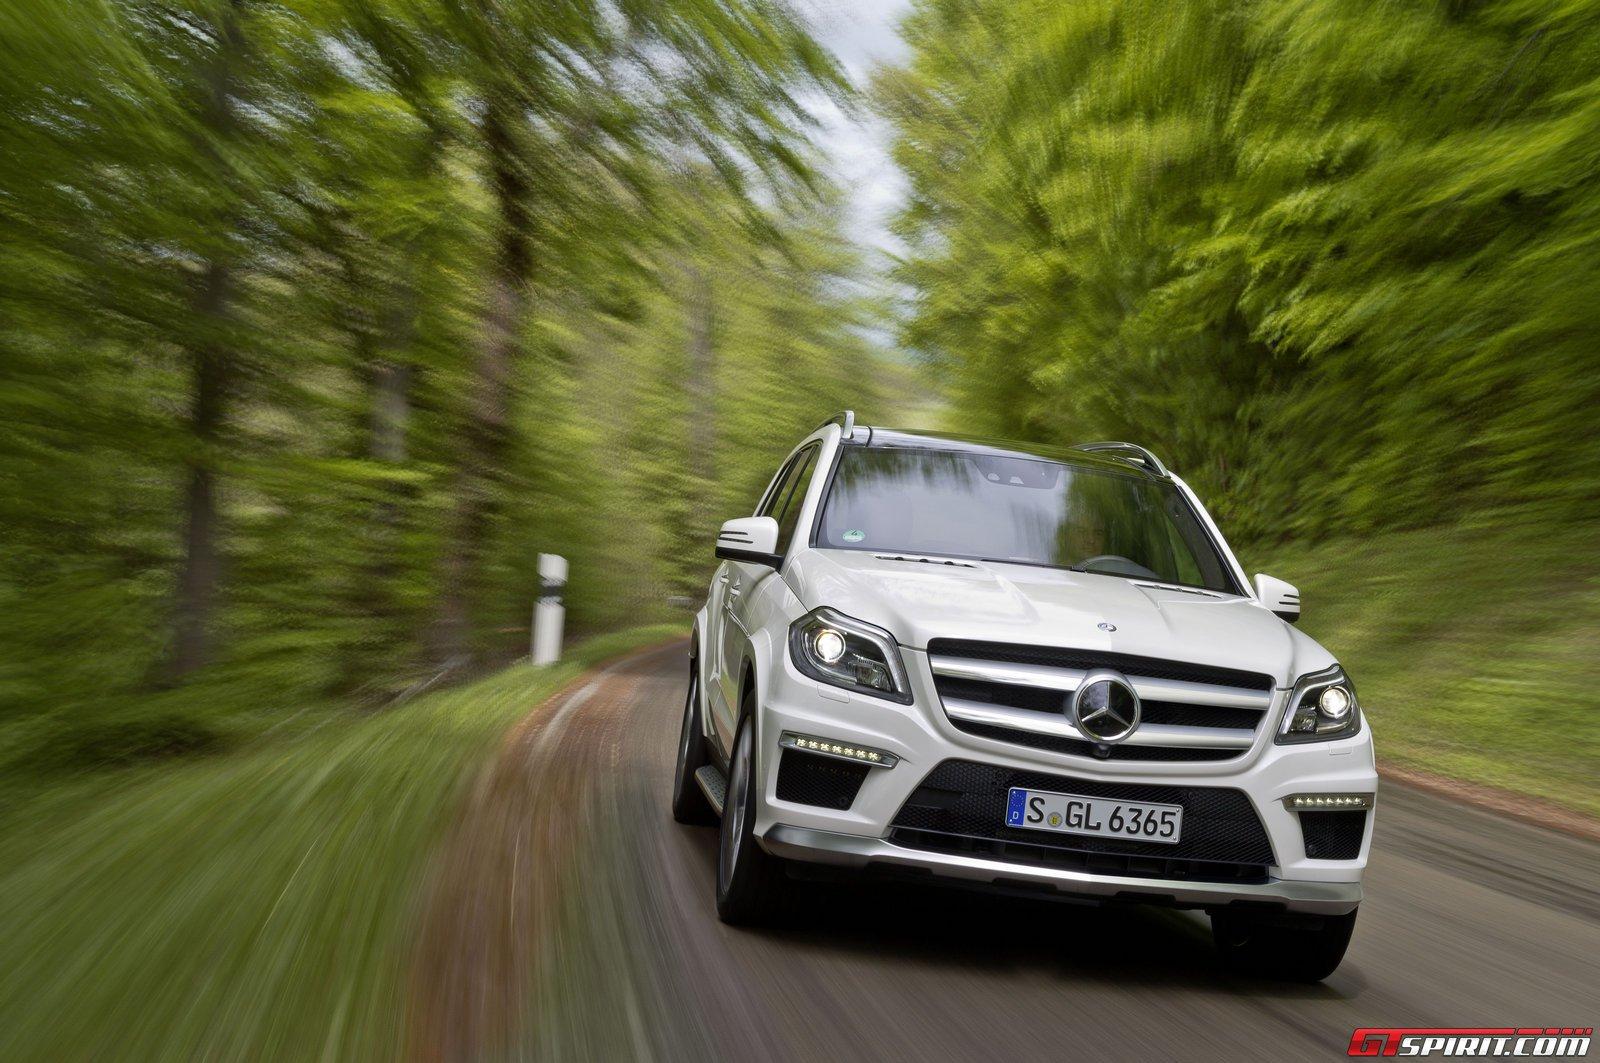 Luxurious mercedes benz gl s class coupe ml coupe models for Mercedes benz gl